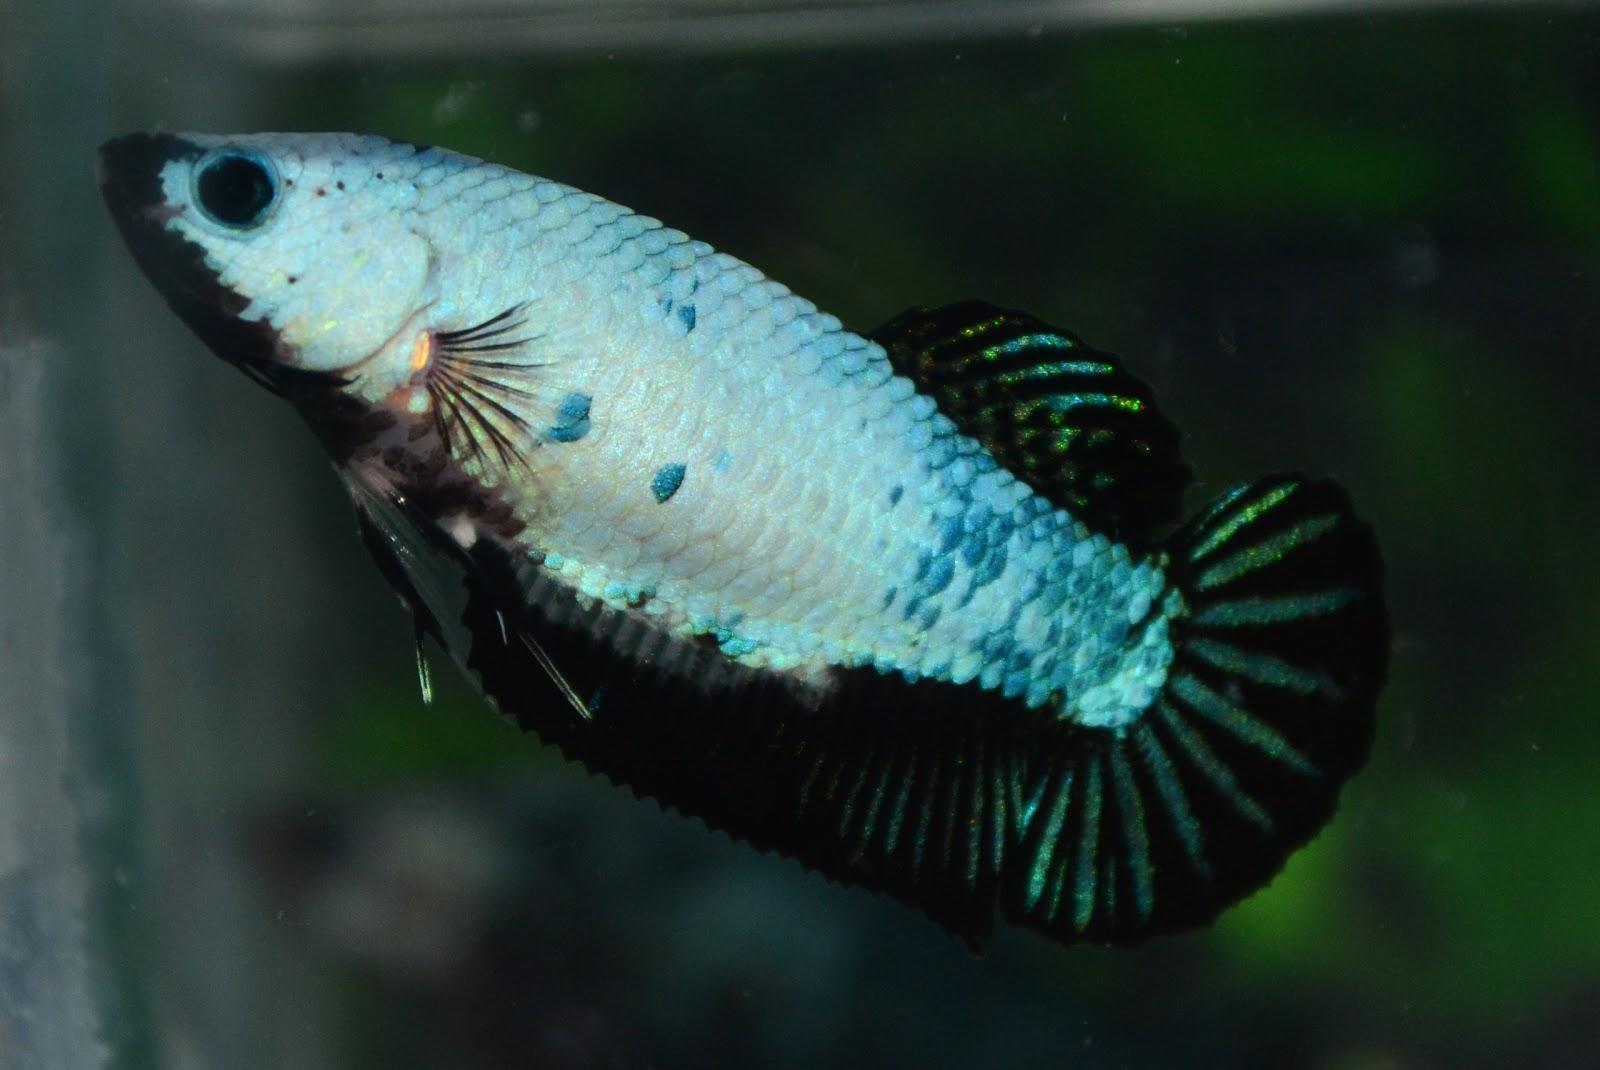 Betta fish afira betta hmpk fancy female oct 2012 for Pictures of betta fish